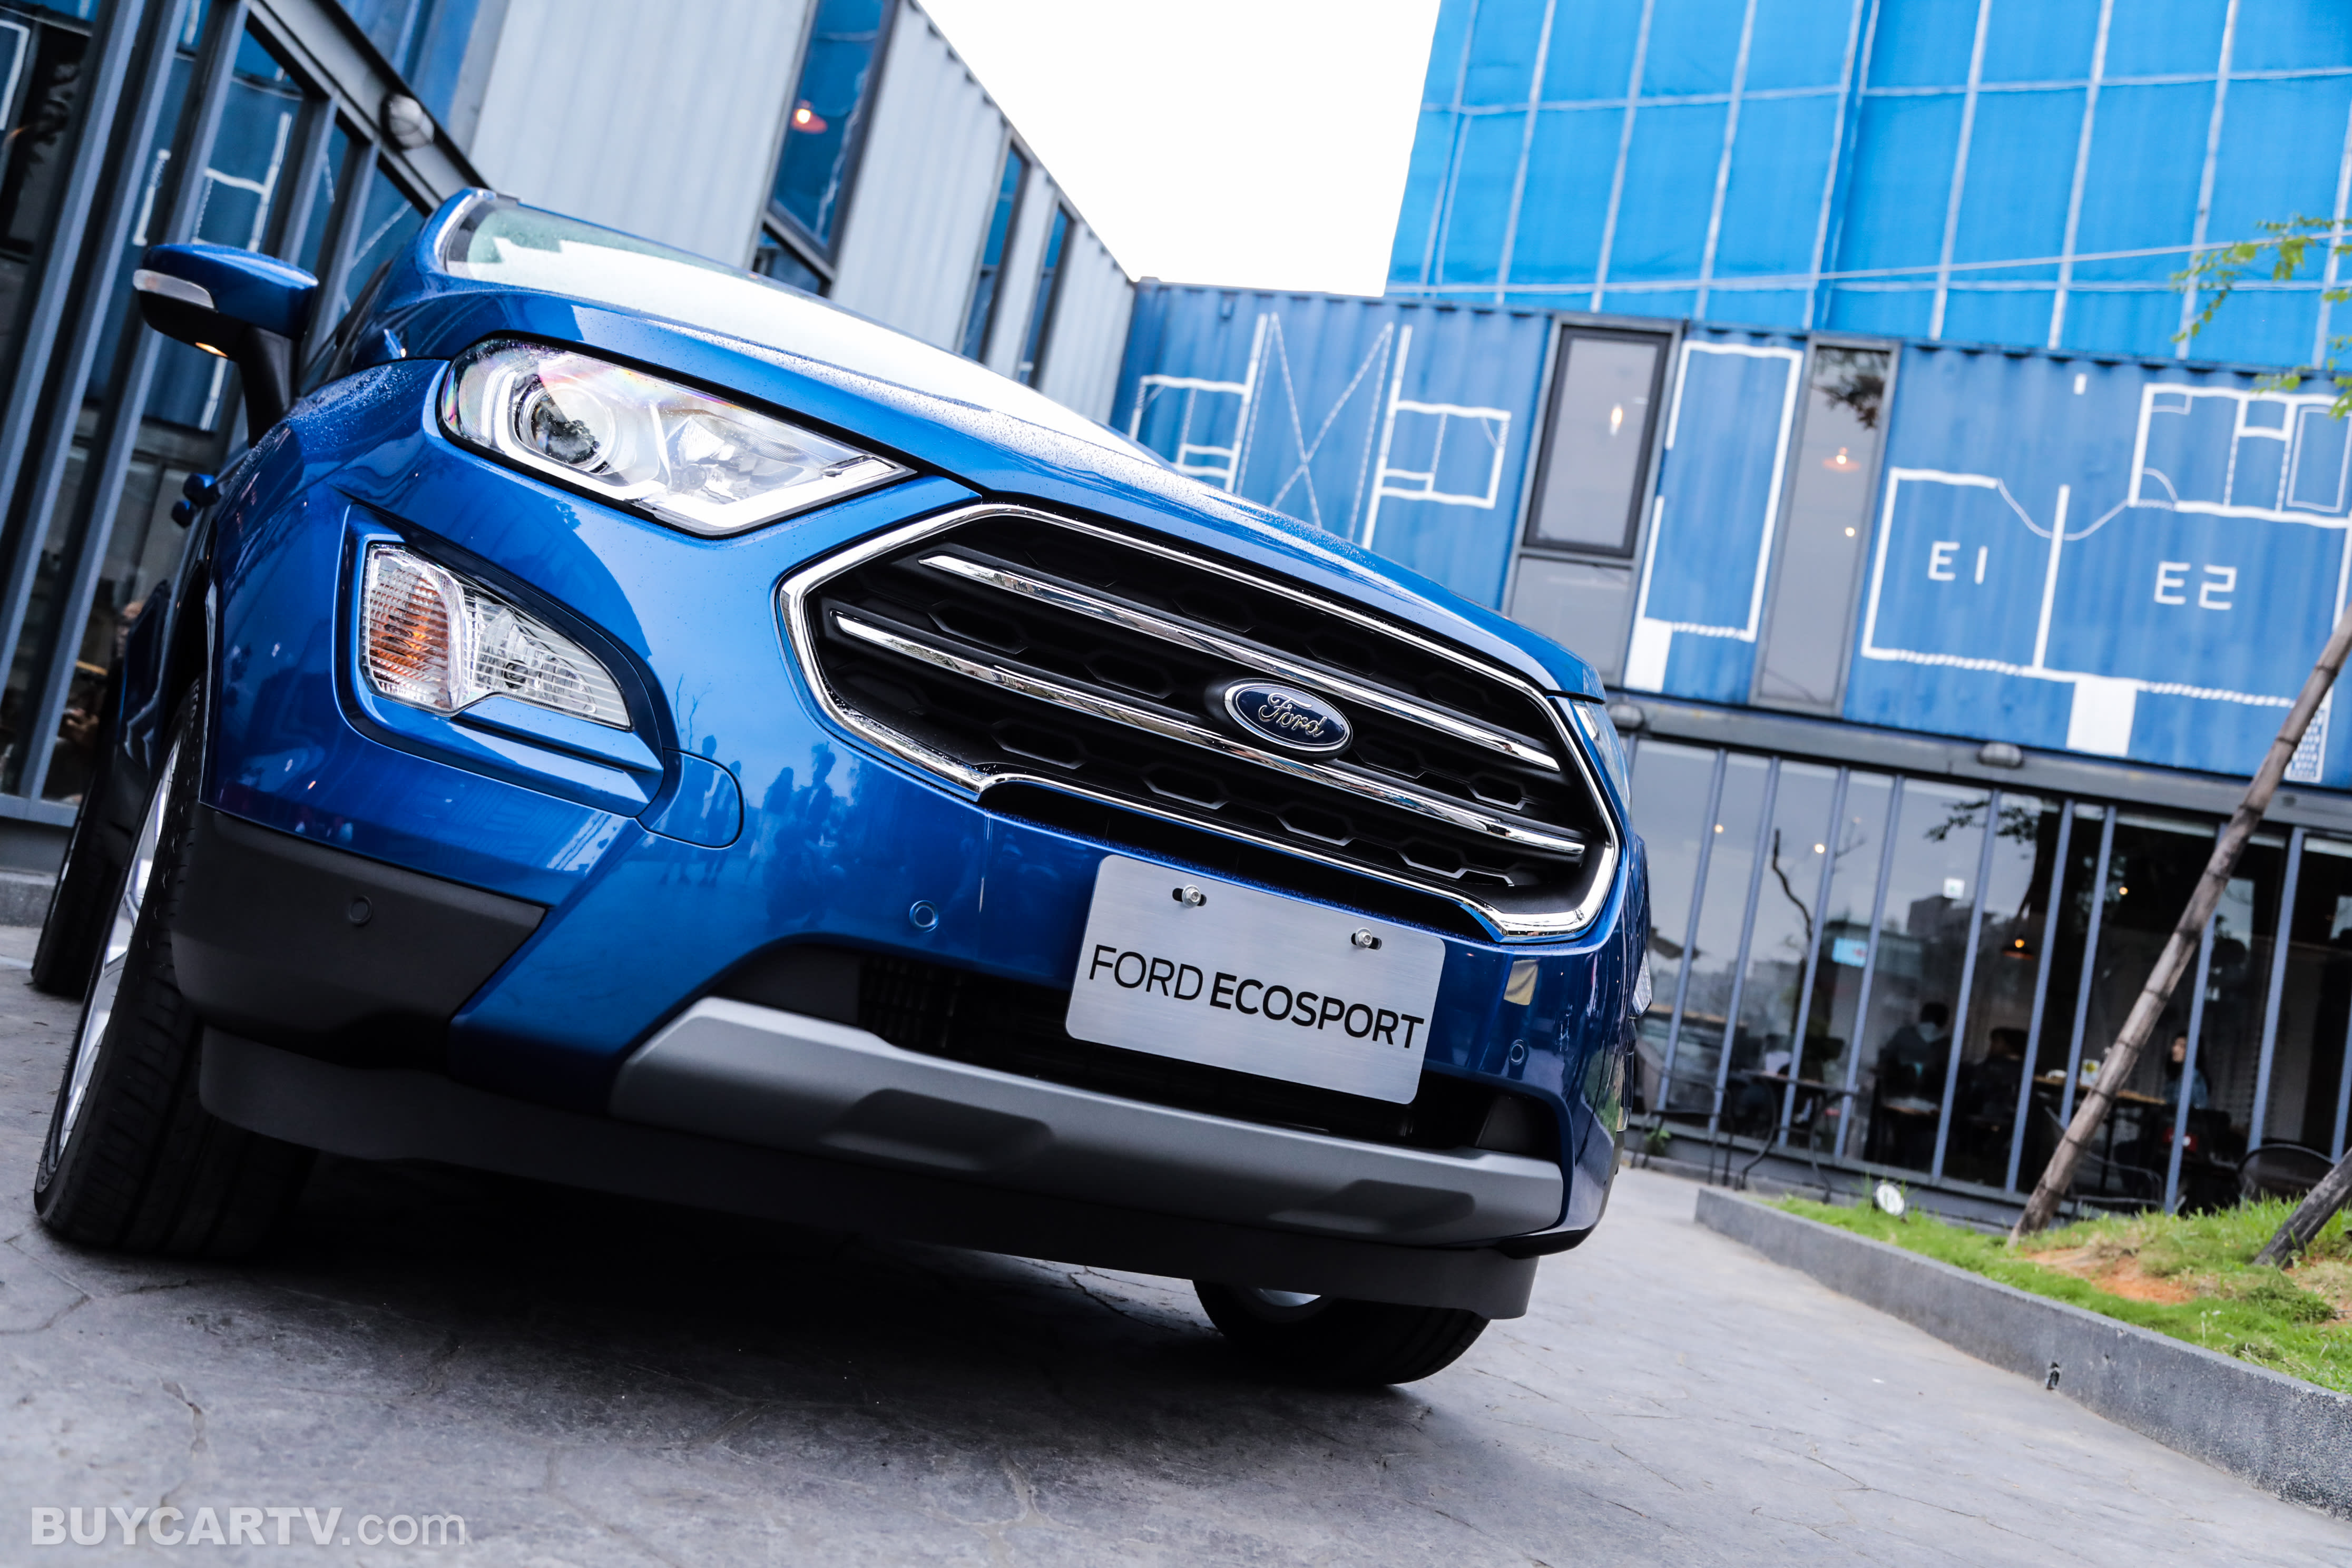 Ford EcoSport 1.0L 動力登場!預接單價70.9萬元起!